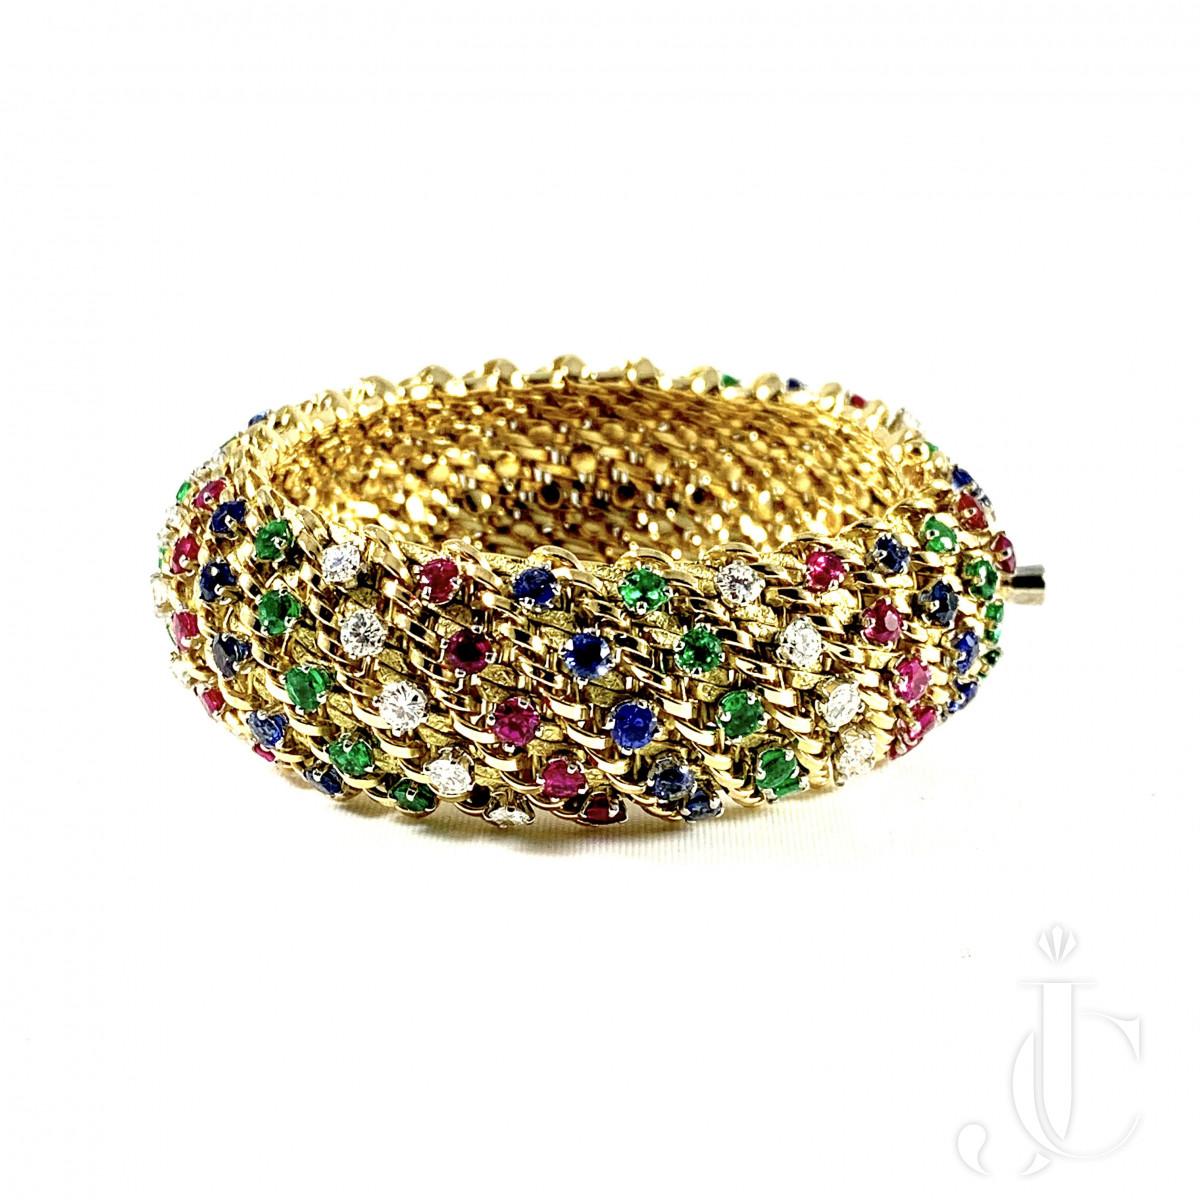 Oscar Heyman Brothers 18kt Yellow Gold Gemset Bracelet